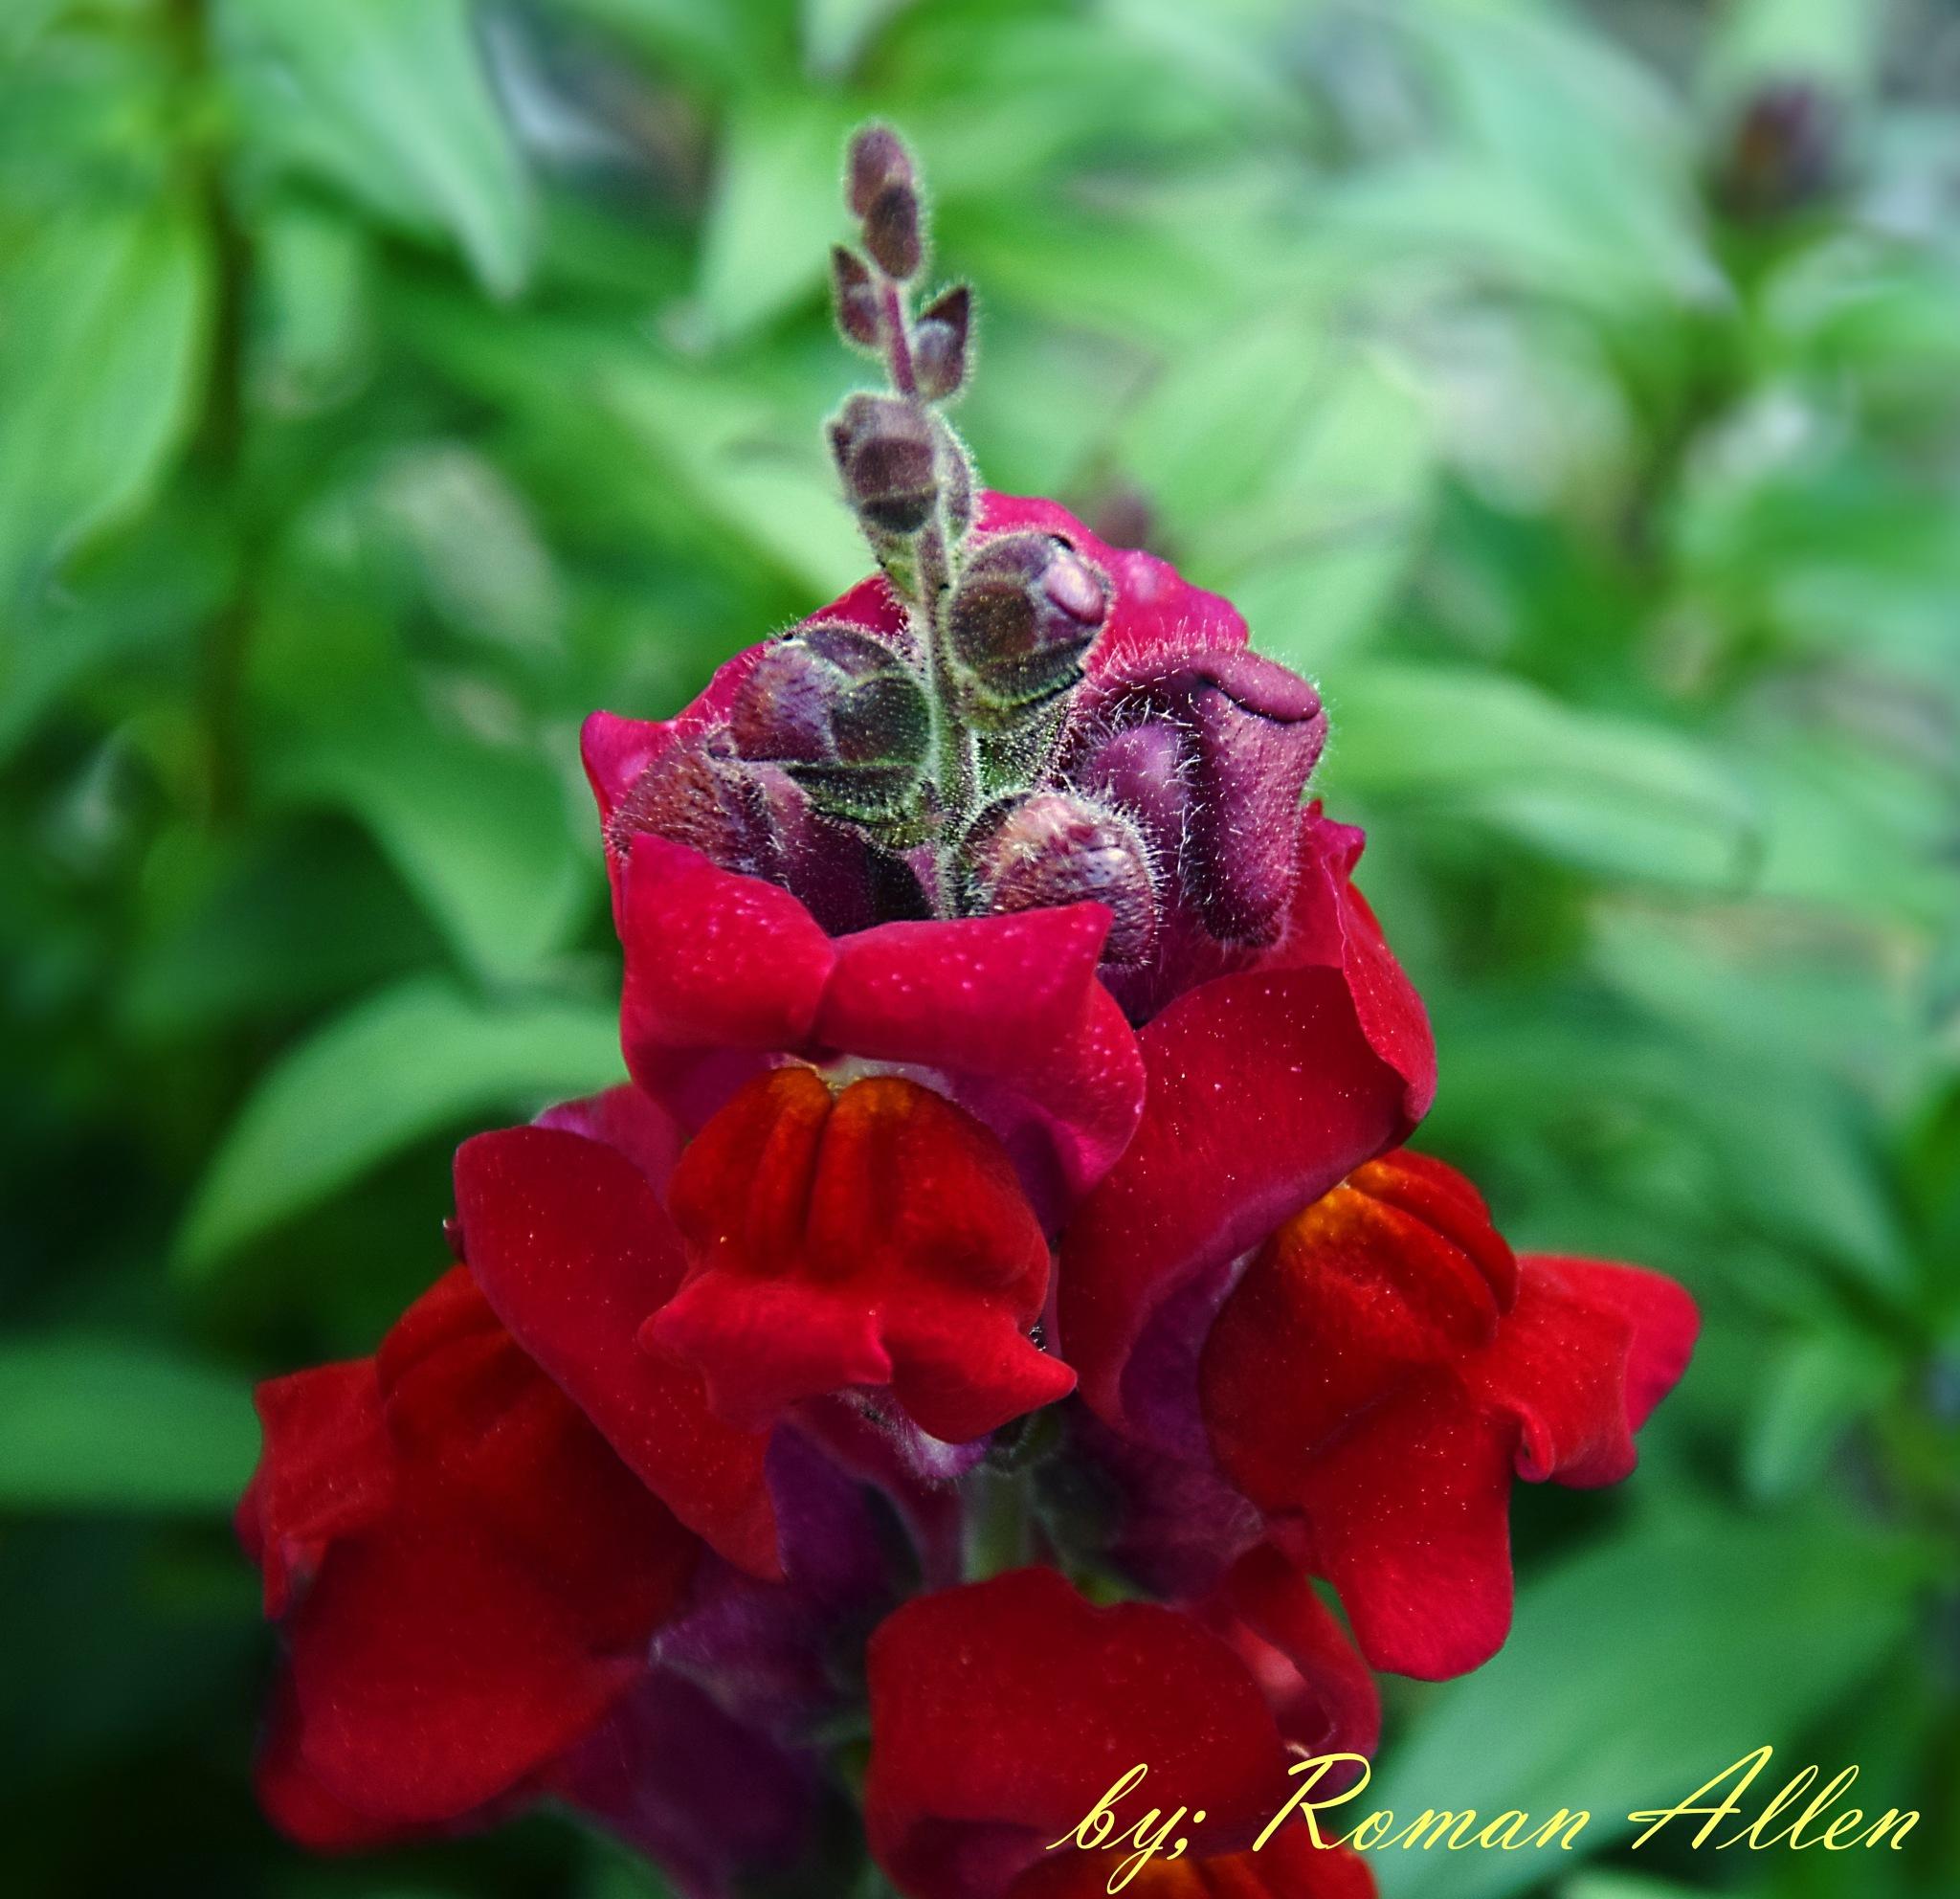 Sweet Flower by roman.aridrums